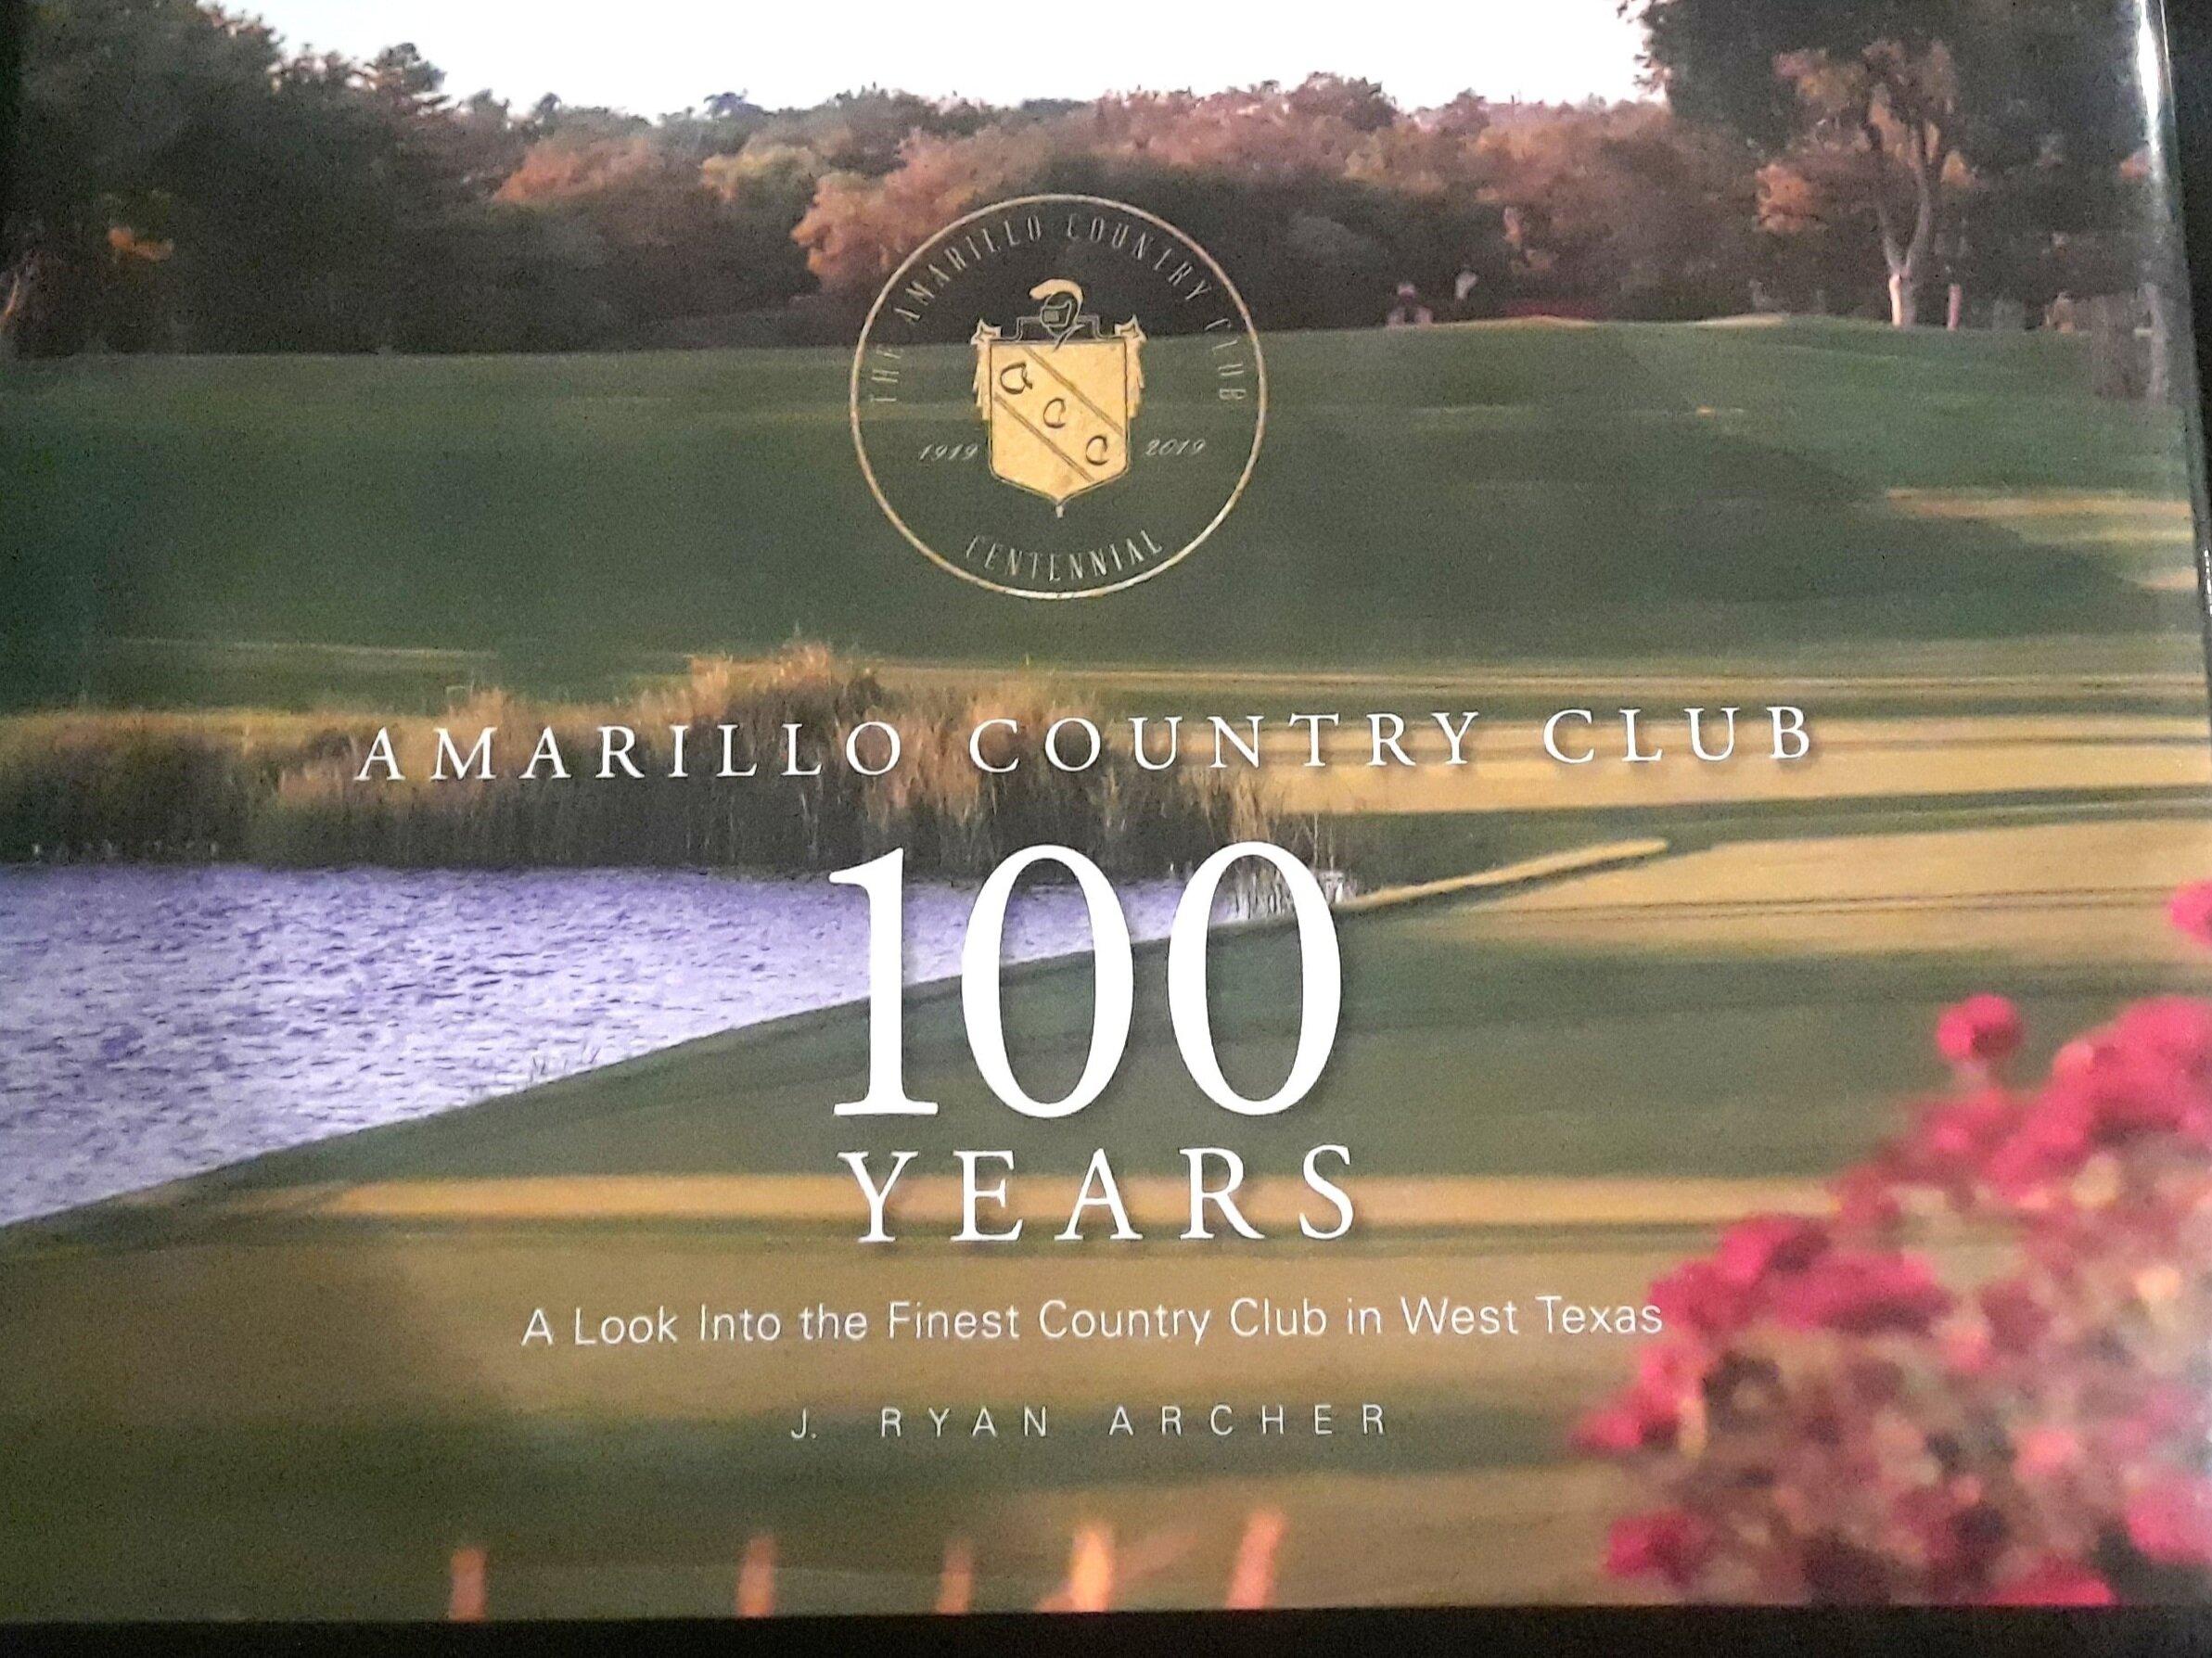 Amarillo CC book cover.jpg